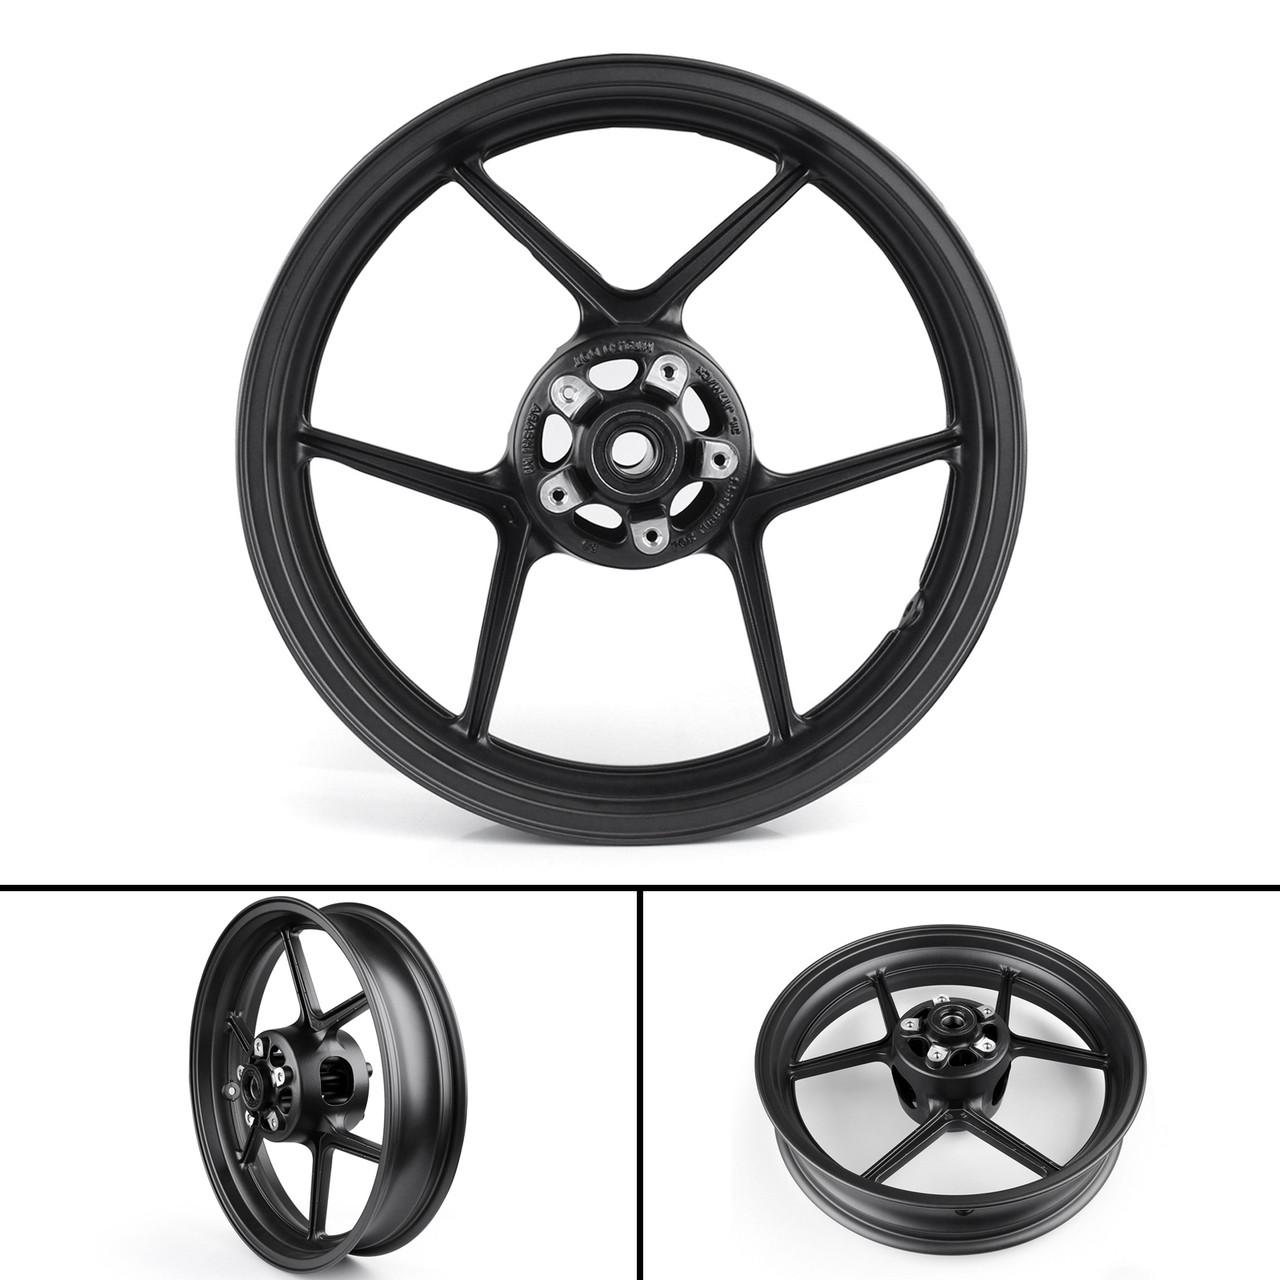 small resolution of front wheel rim for kawasaki ninja zx6r 2005 2012 zx10r 2006 2010 z750 2007